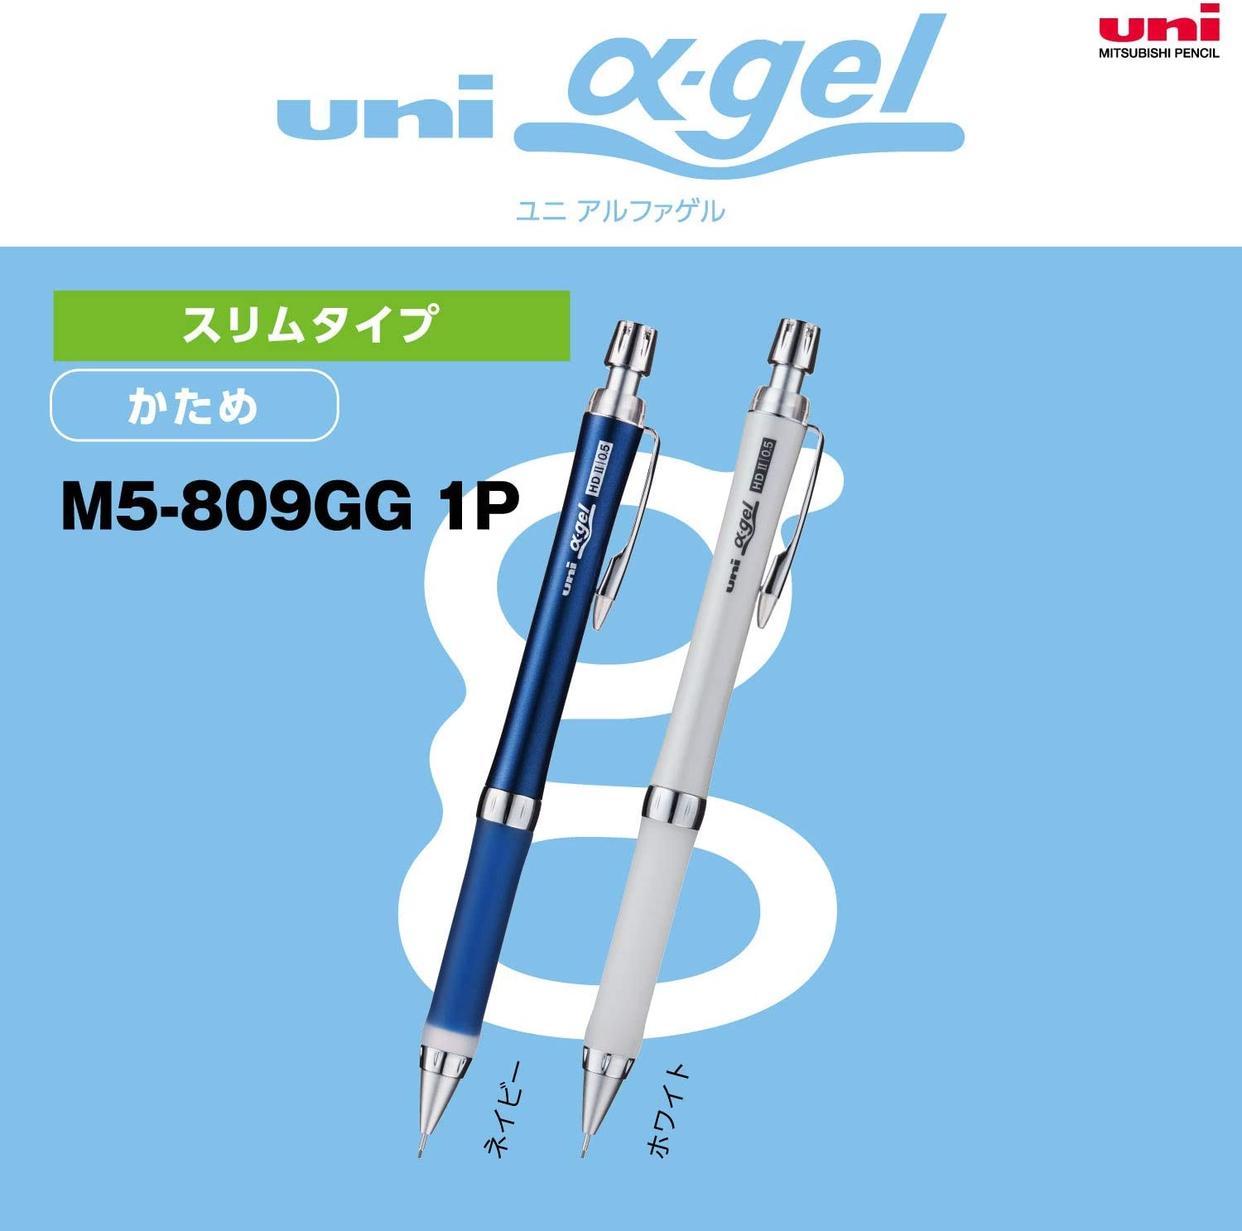 uni α-gel(ユニ アルファゲル) スリムタイプ:かため M5-809GG 1Pの商品画像4